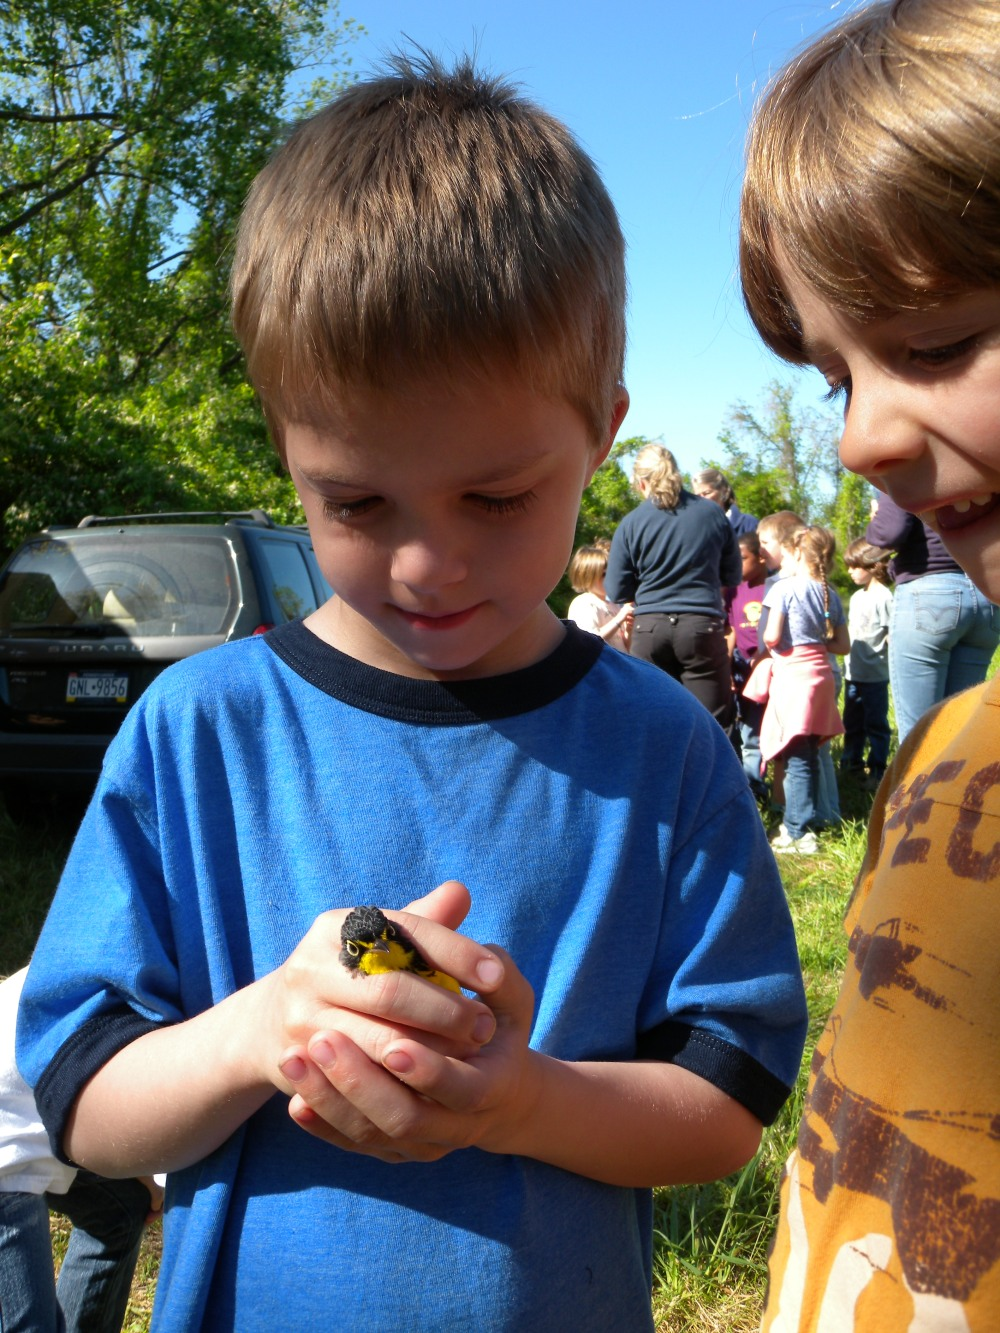 Westtown 1st grader holding Canada Warbler.  Photo by Blake Goll